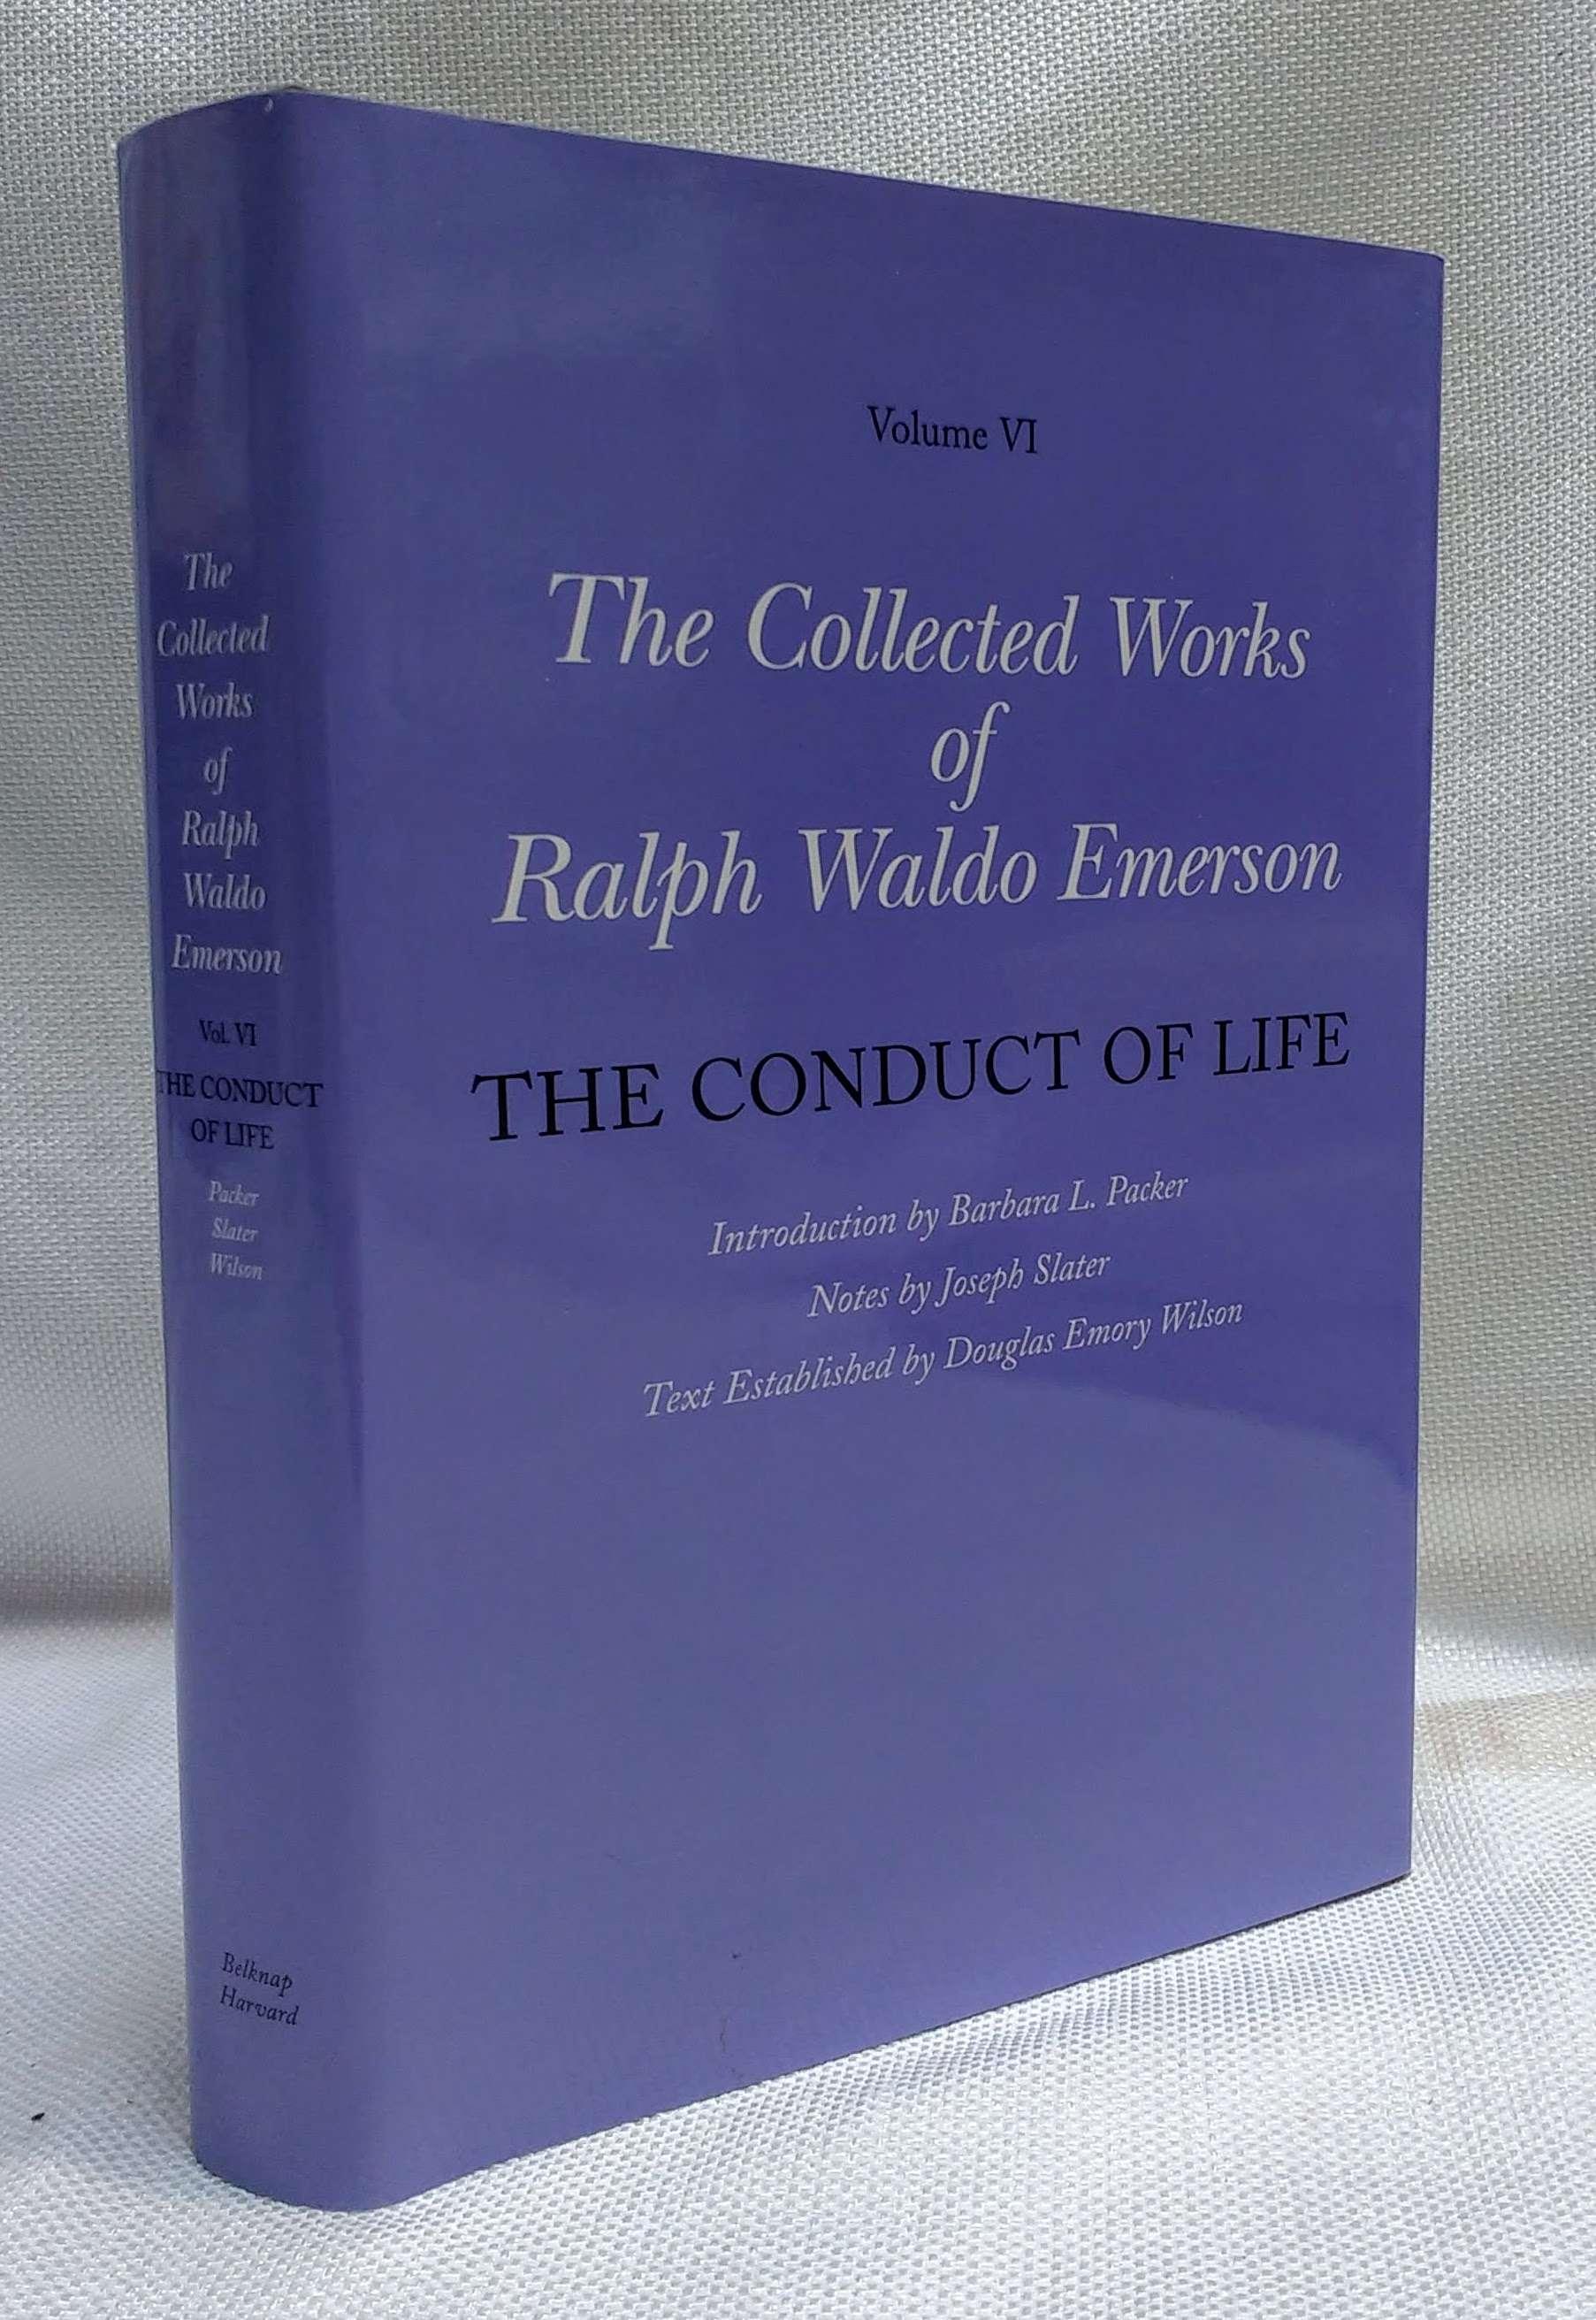 Collected Works of Ralph Waldo Emerson, Volume VI: The Conduct of Life, Emerson, Ralph Waldo; Packer, Barbara L. [Editor]; Slater, Joseph [Editor]; Wilson, Douglas Emory [Editor];